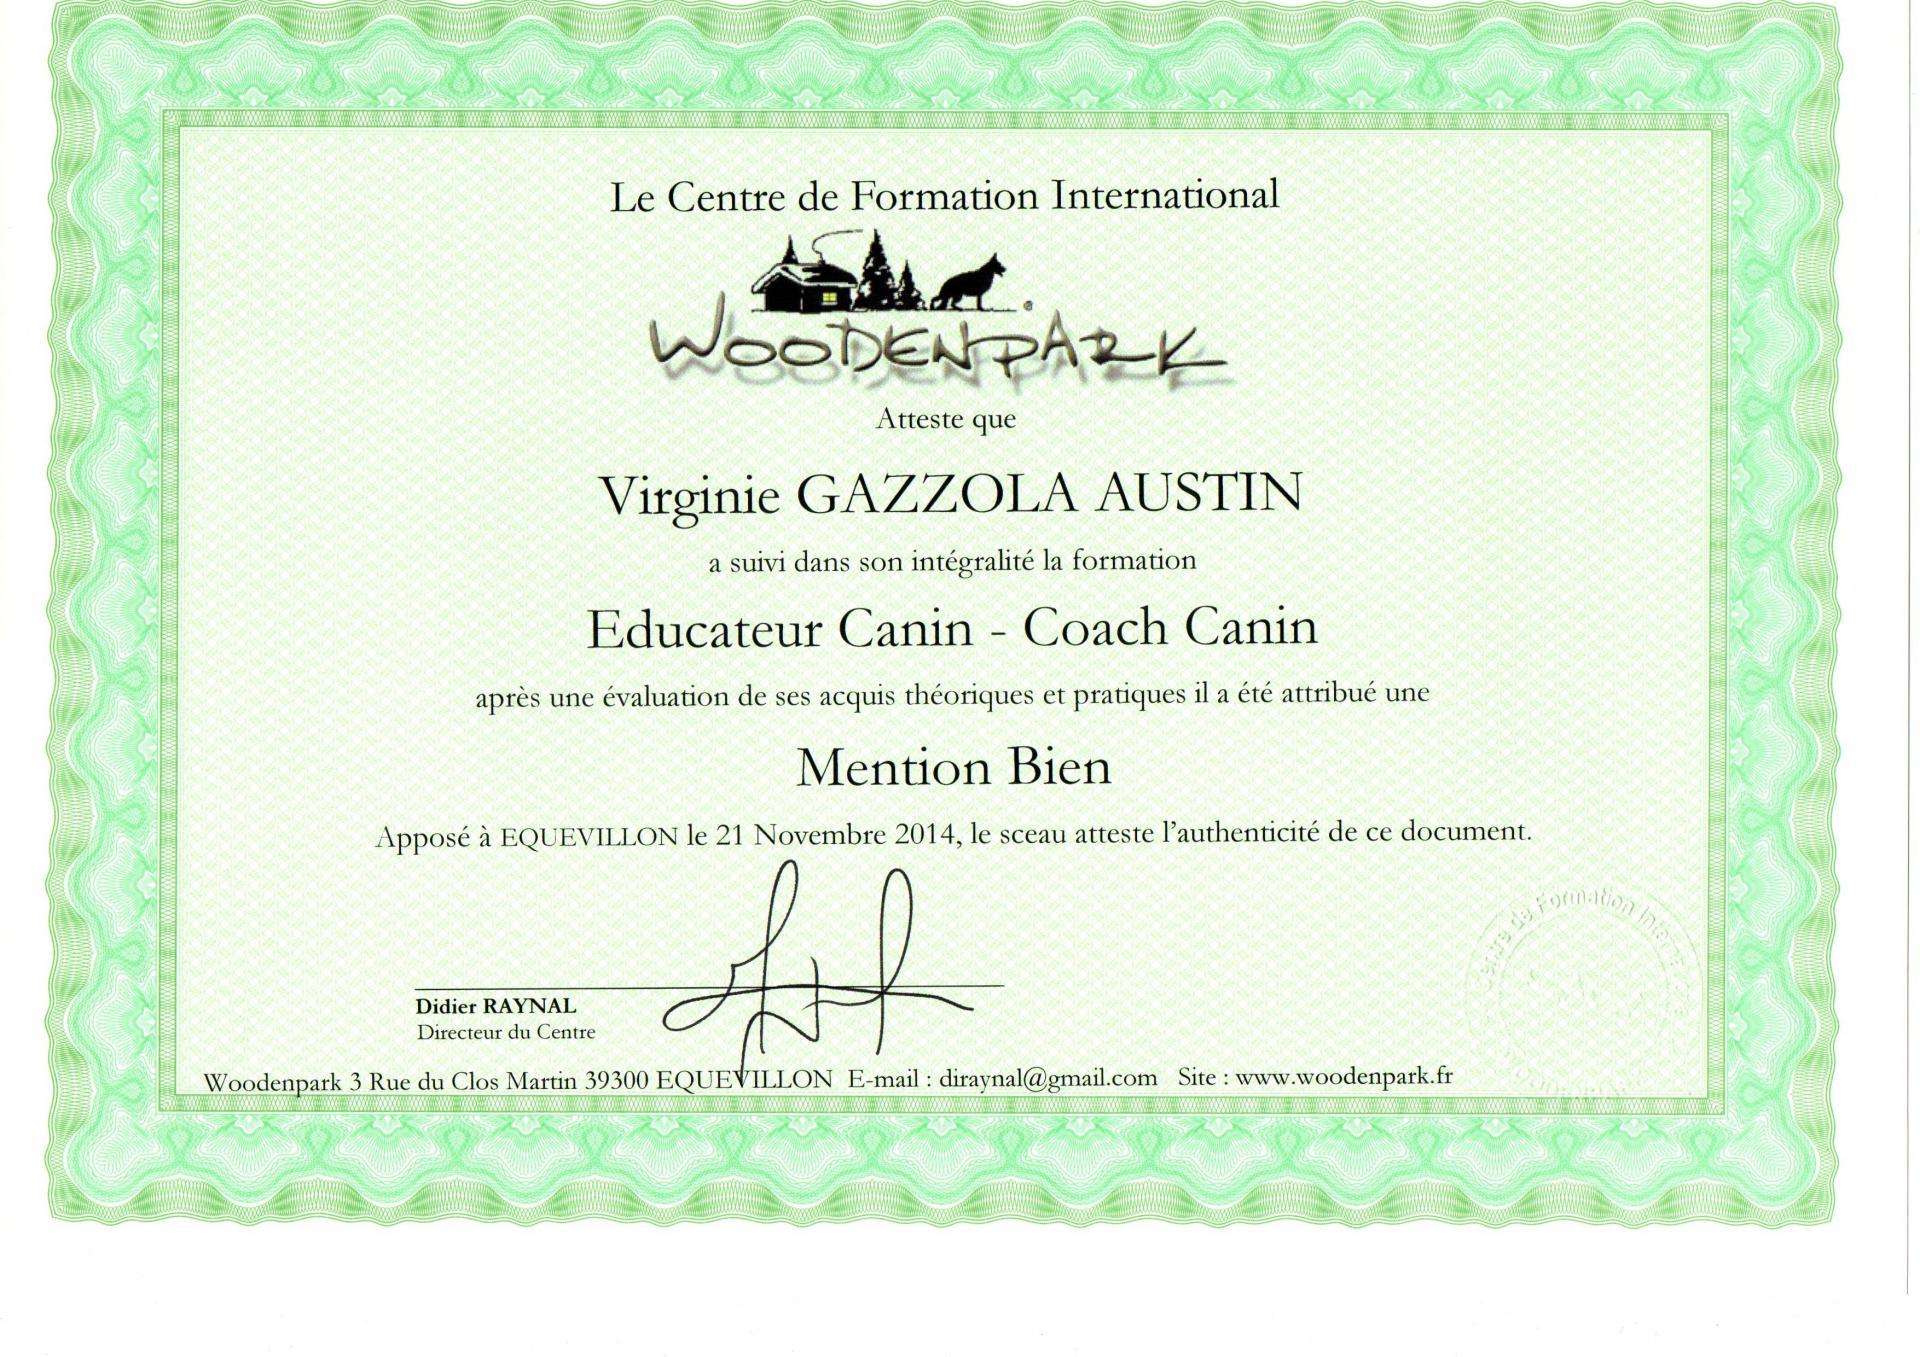 EDUCATEUR CANIN - COACH CANIN